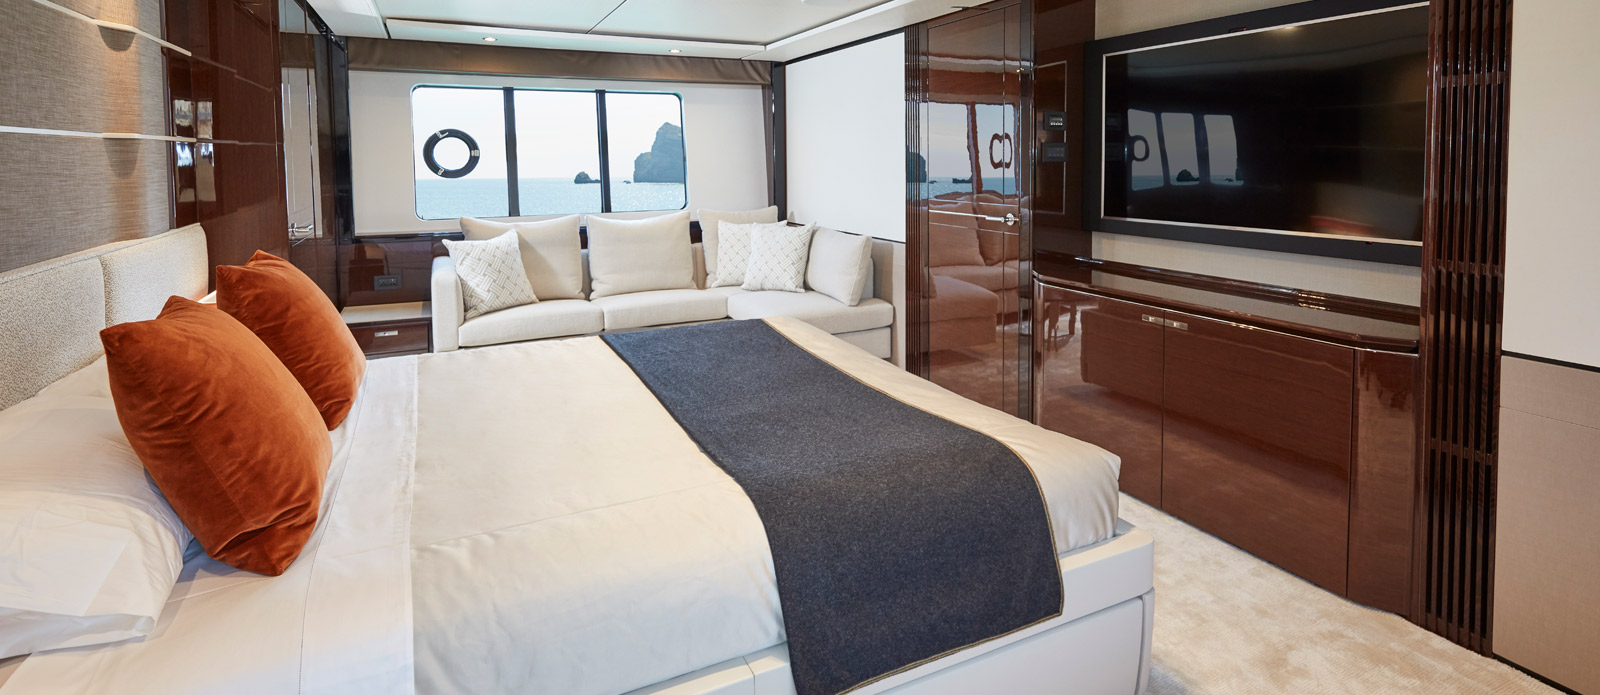 Princess 30 Metre Yacht Bandazul - VIP Cabin